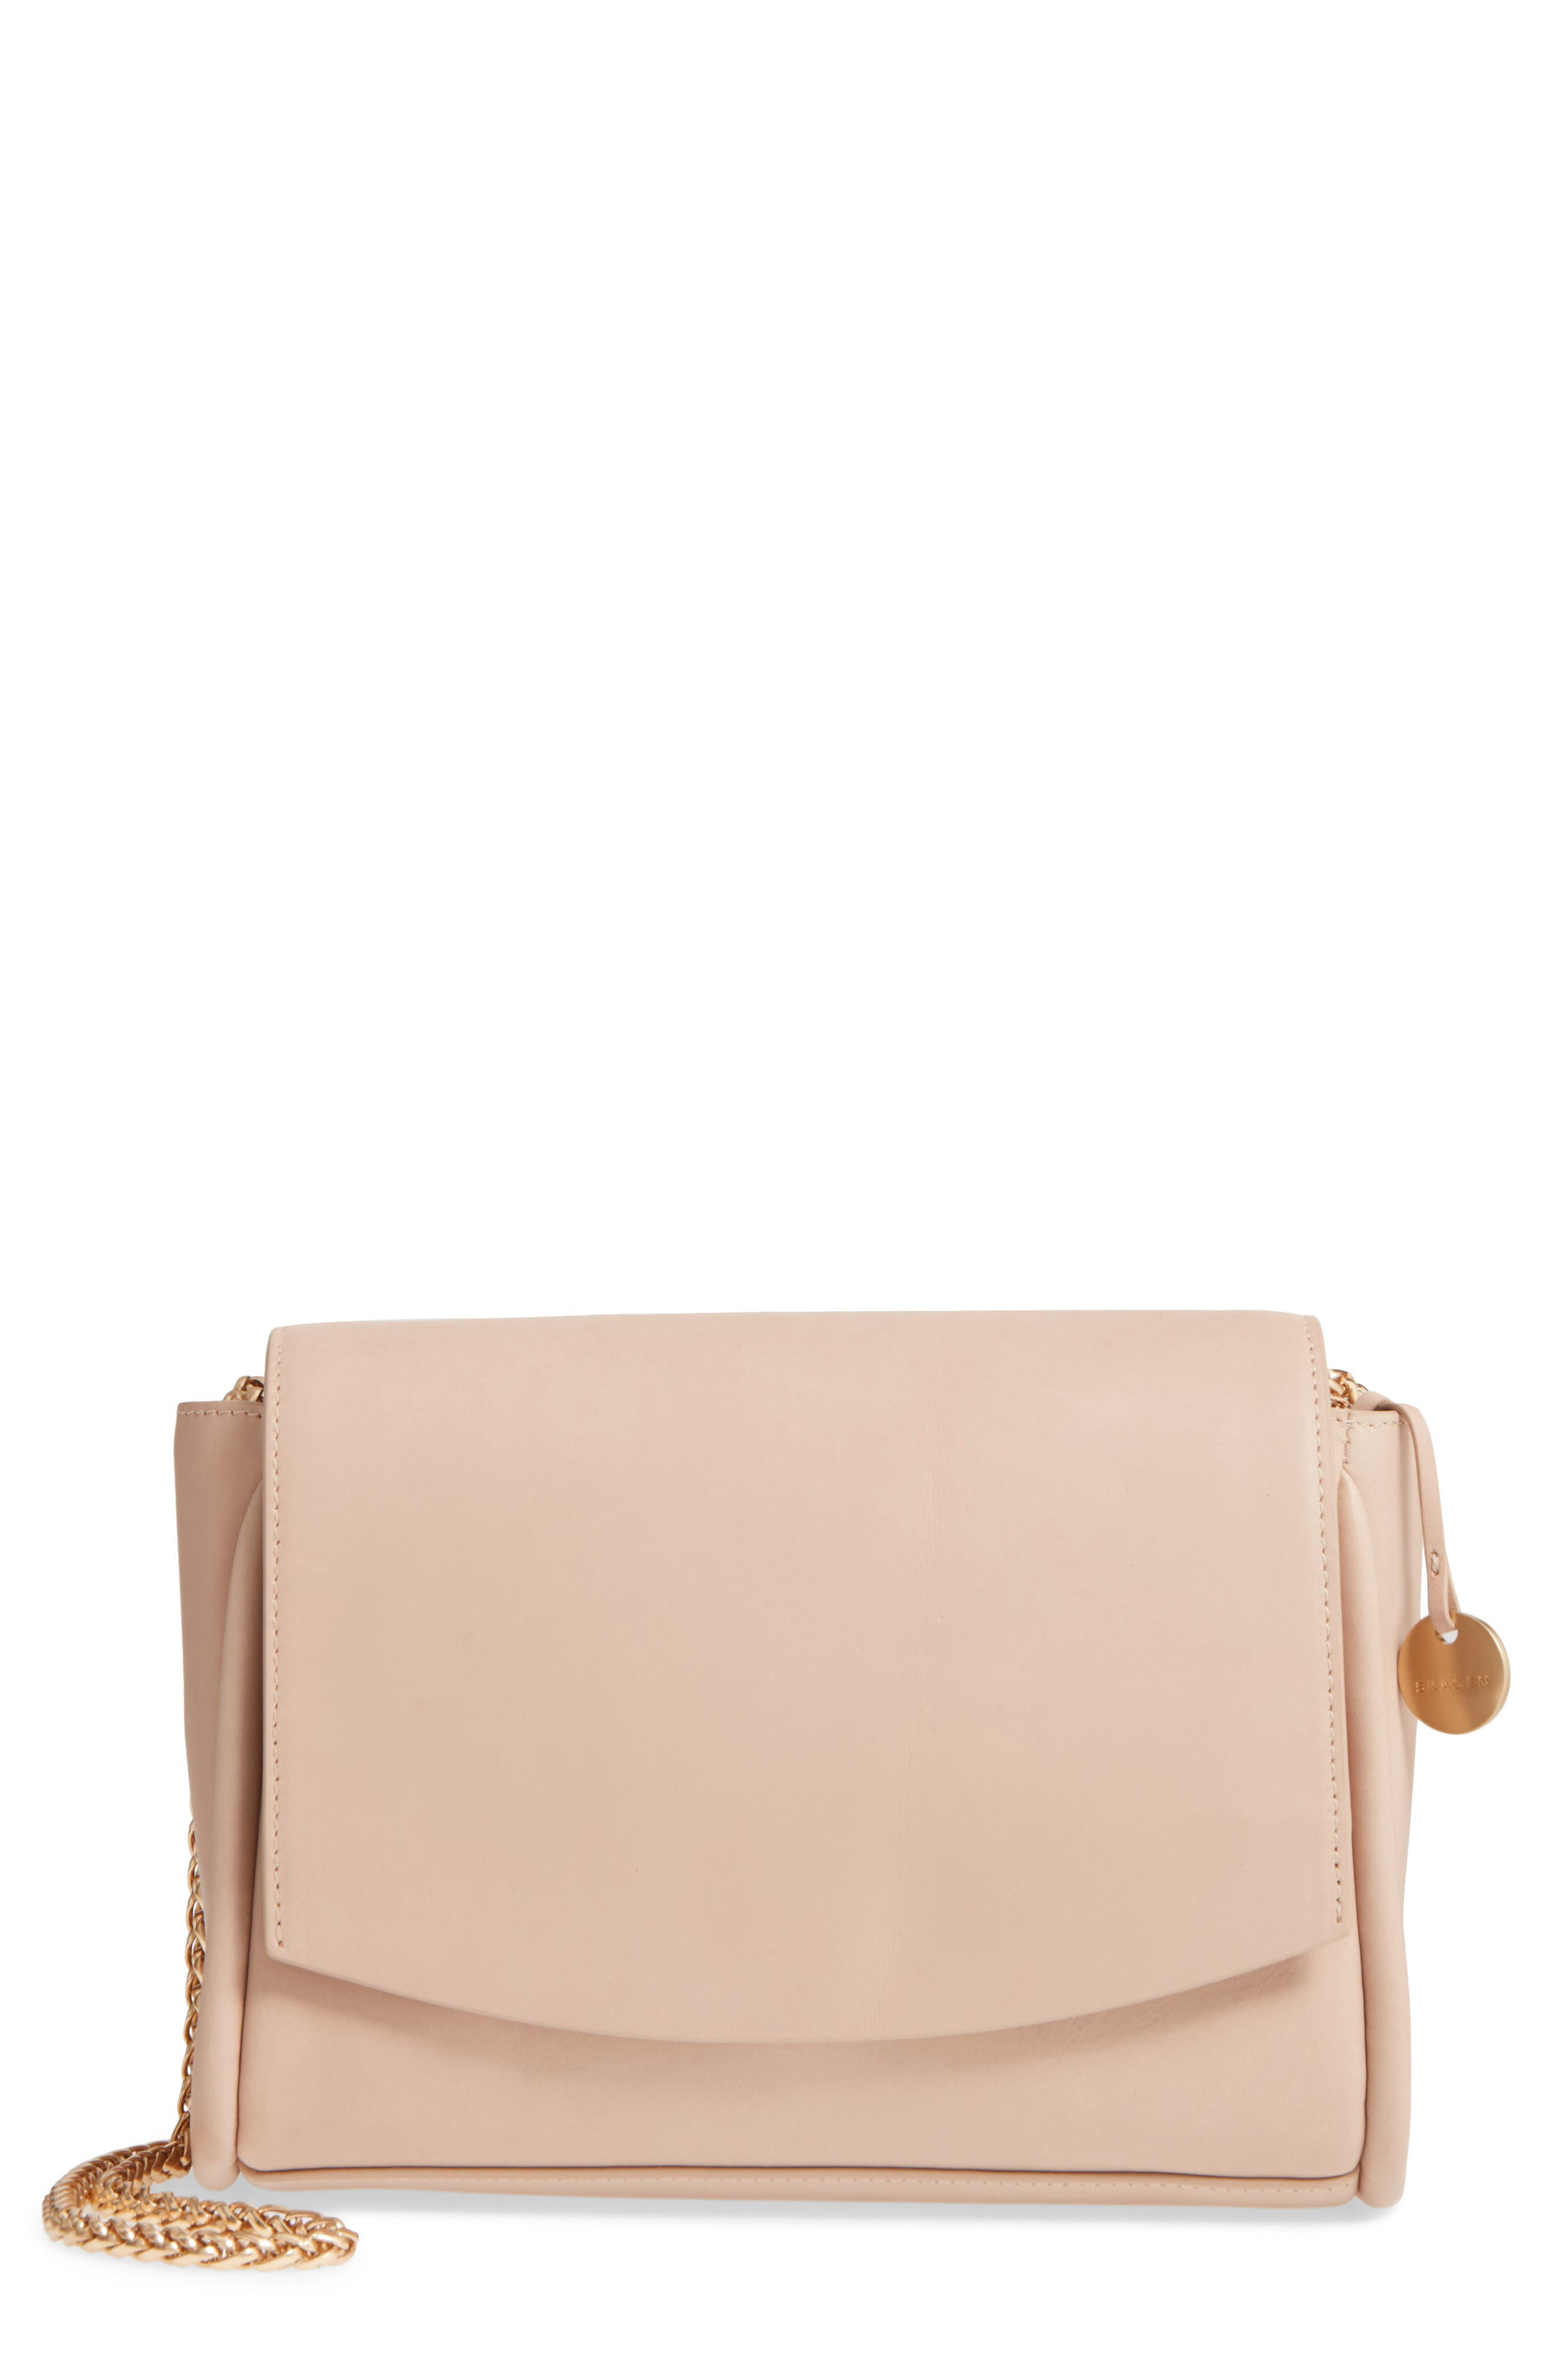 Sylvi Calfskin Leather Crossbody Bag,                         Main,                         color, Beige